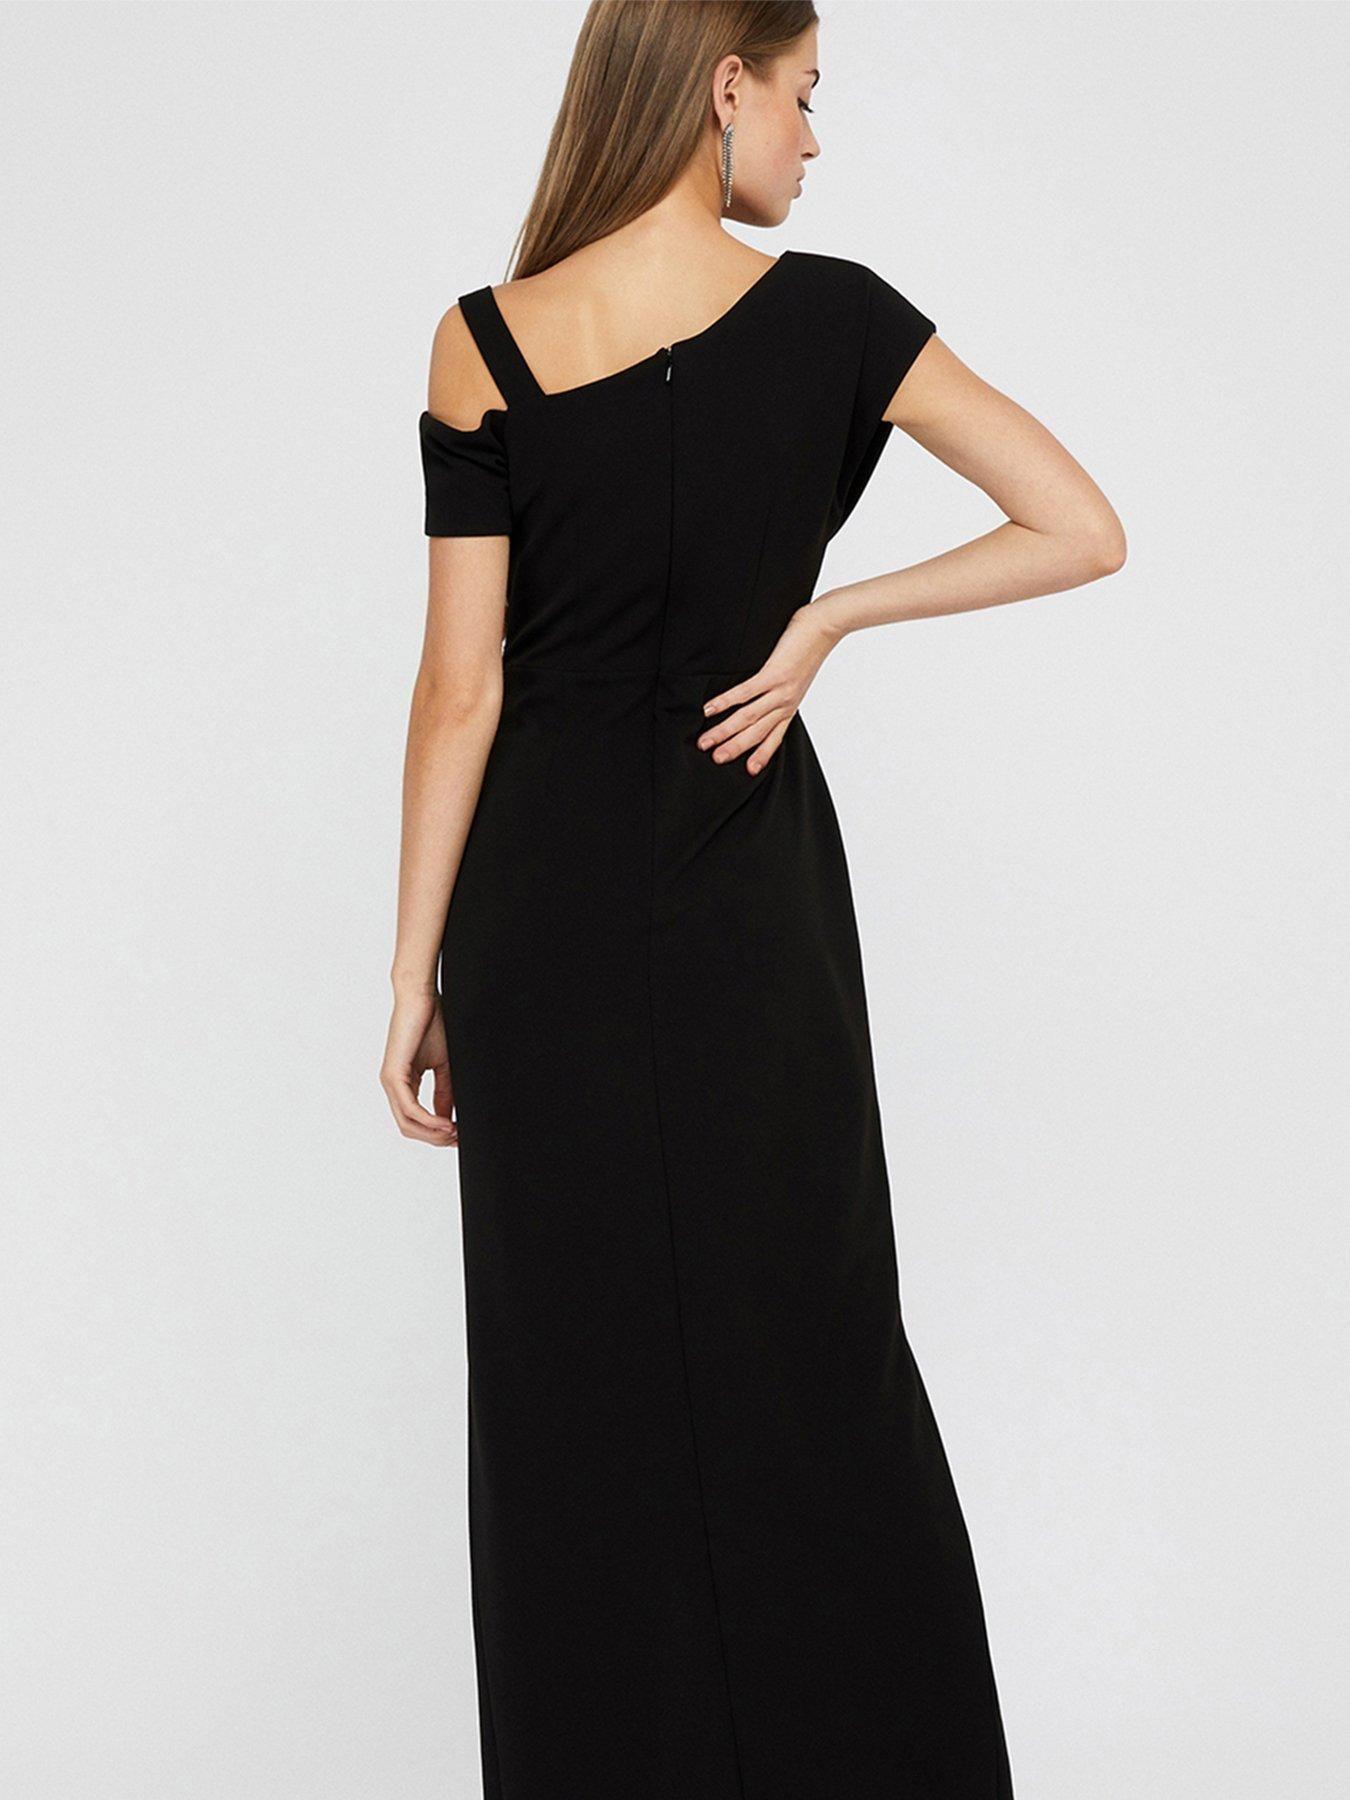 Monsoon Monsoon Octavia Sequin Insert Maxi Dress, Black, Size 10, Women - Black - 10 #blackmaxidress